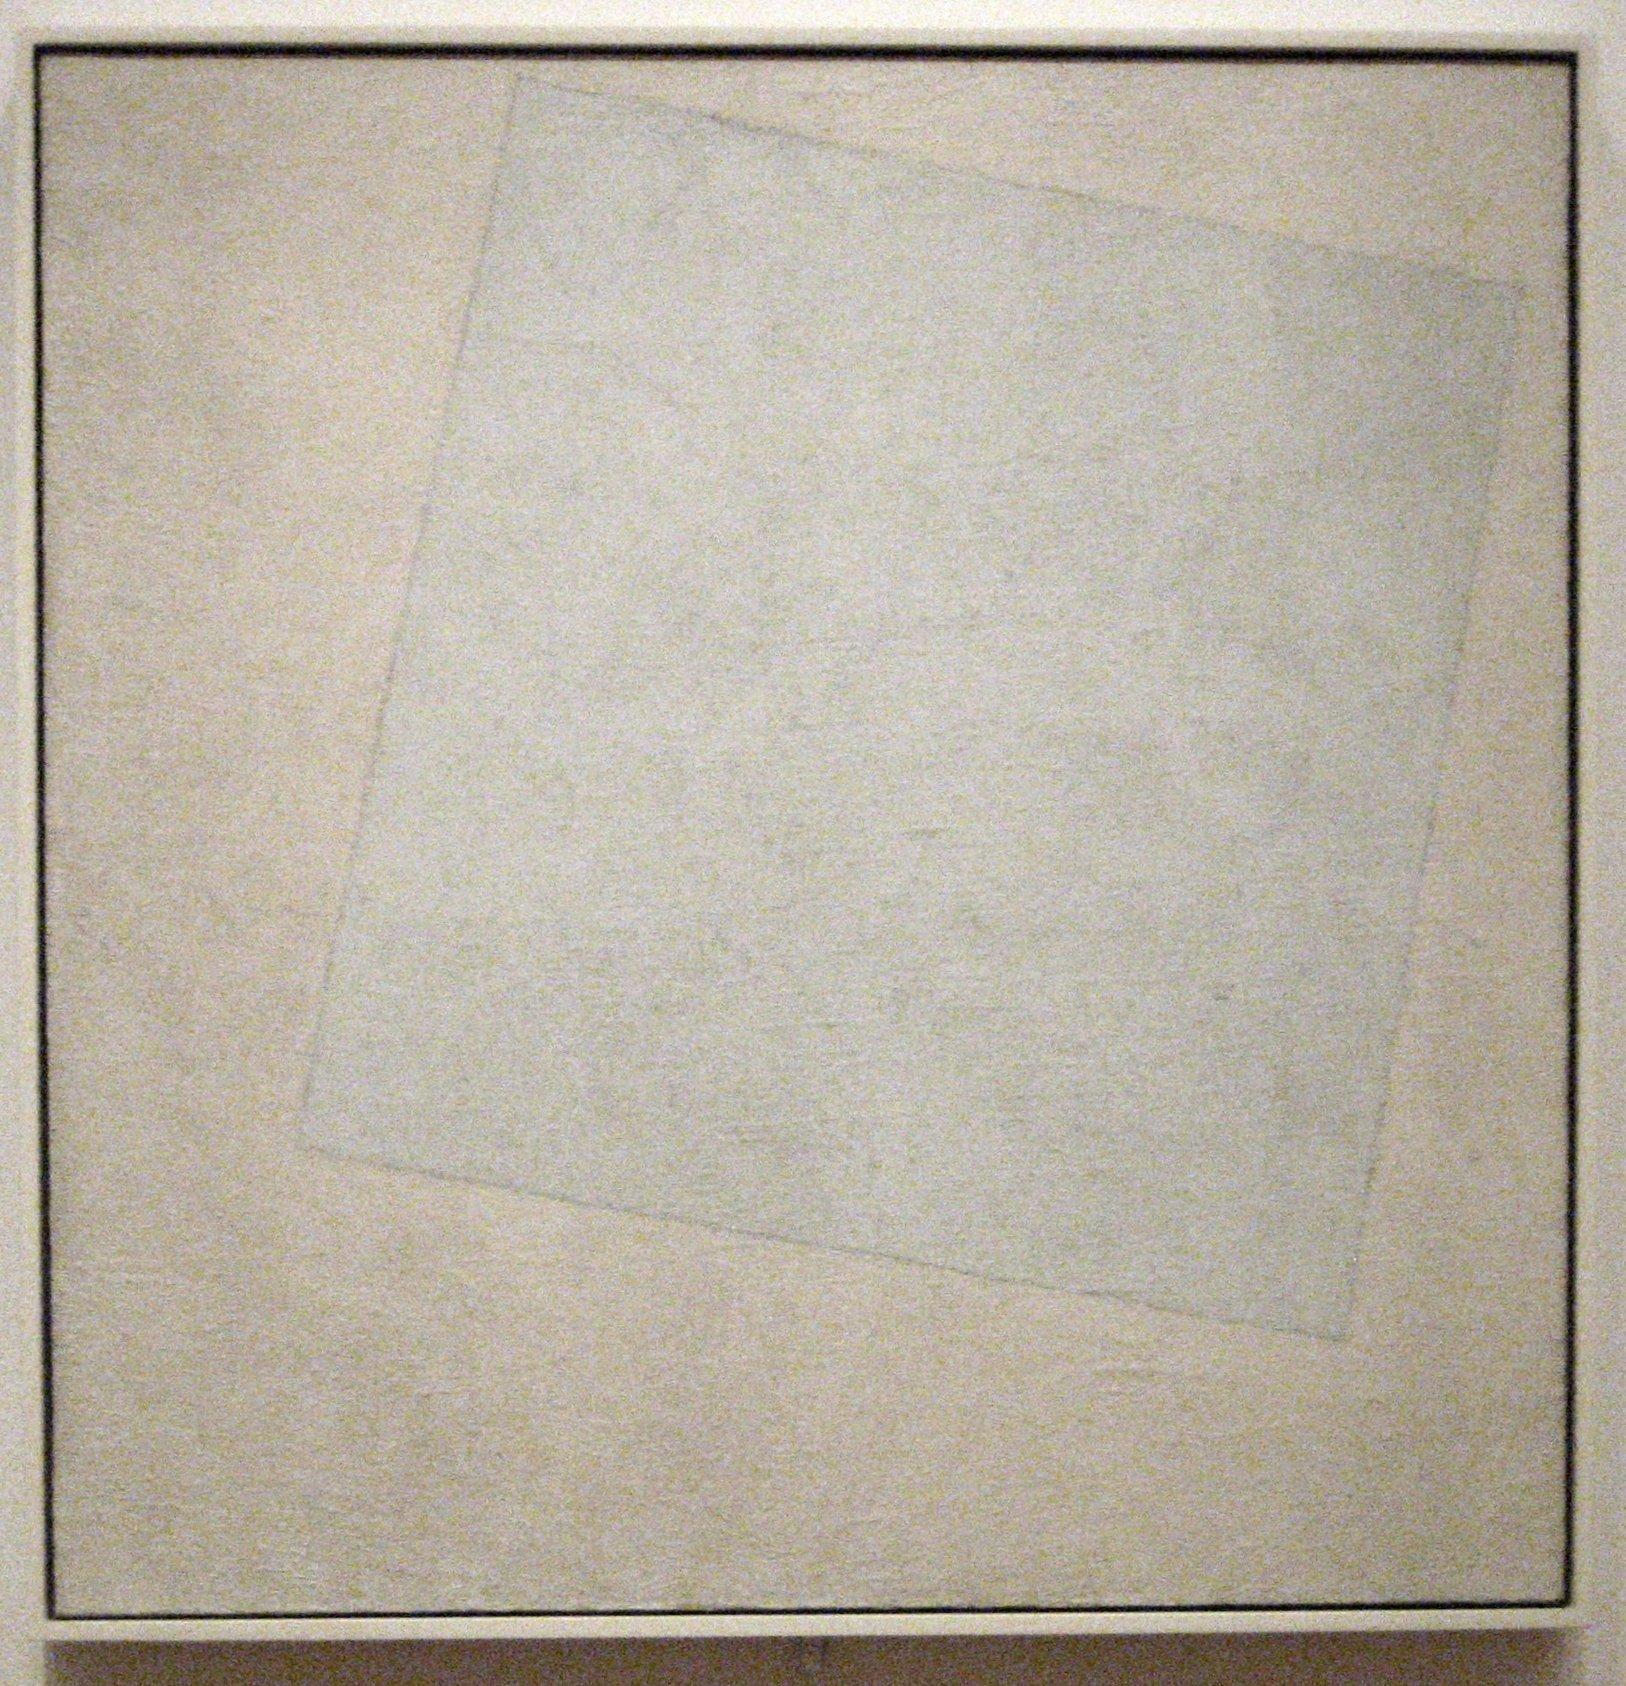 Kazimir Malevich,  Suprematist Composition- White on White , 1918, Museum of Modern Art, New York.